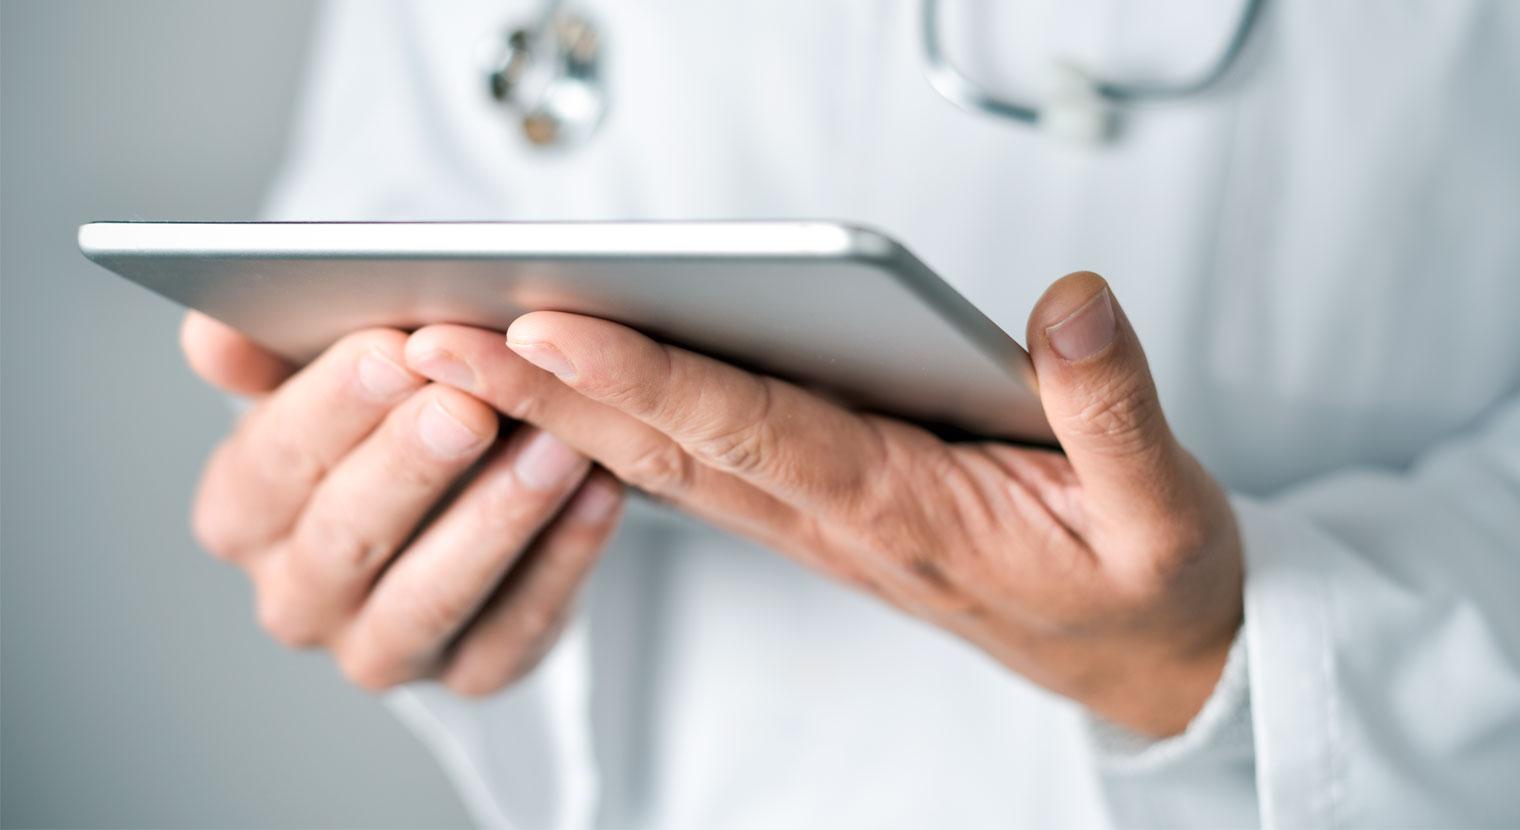 China embraces telemedicine | Insights | HSBC